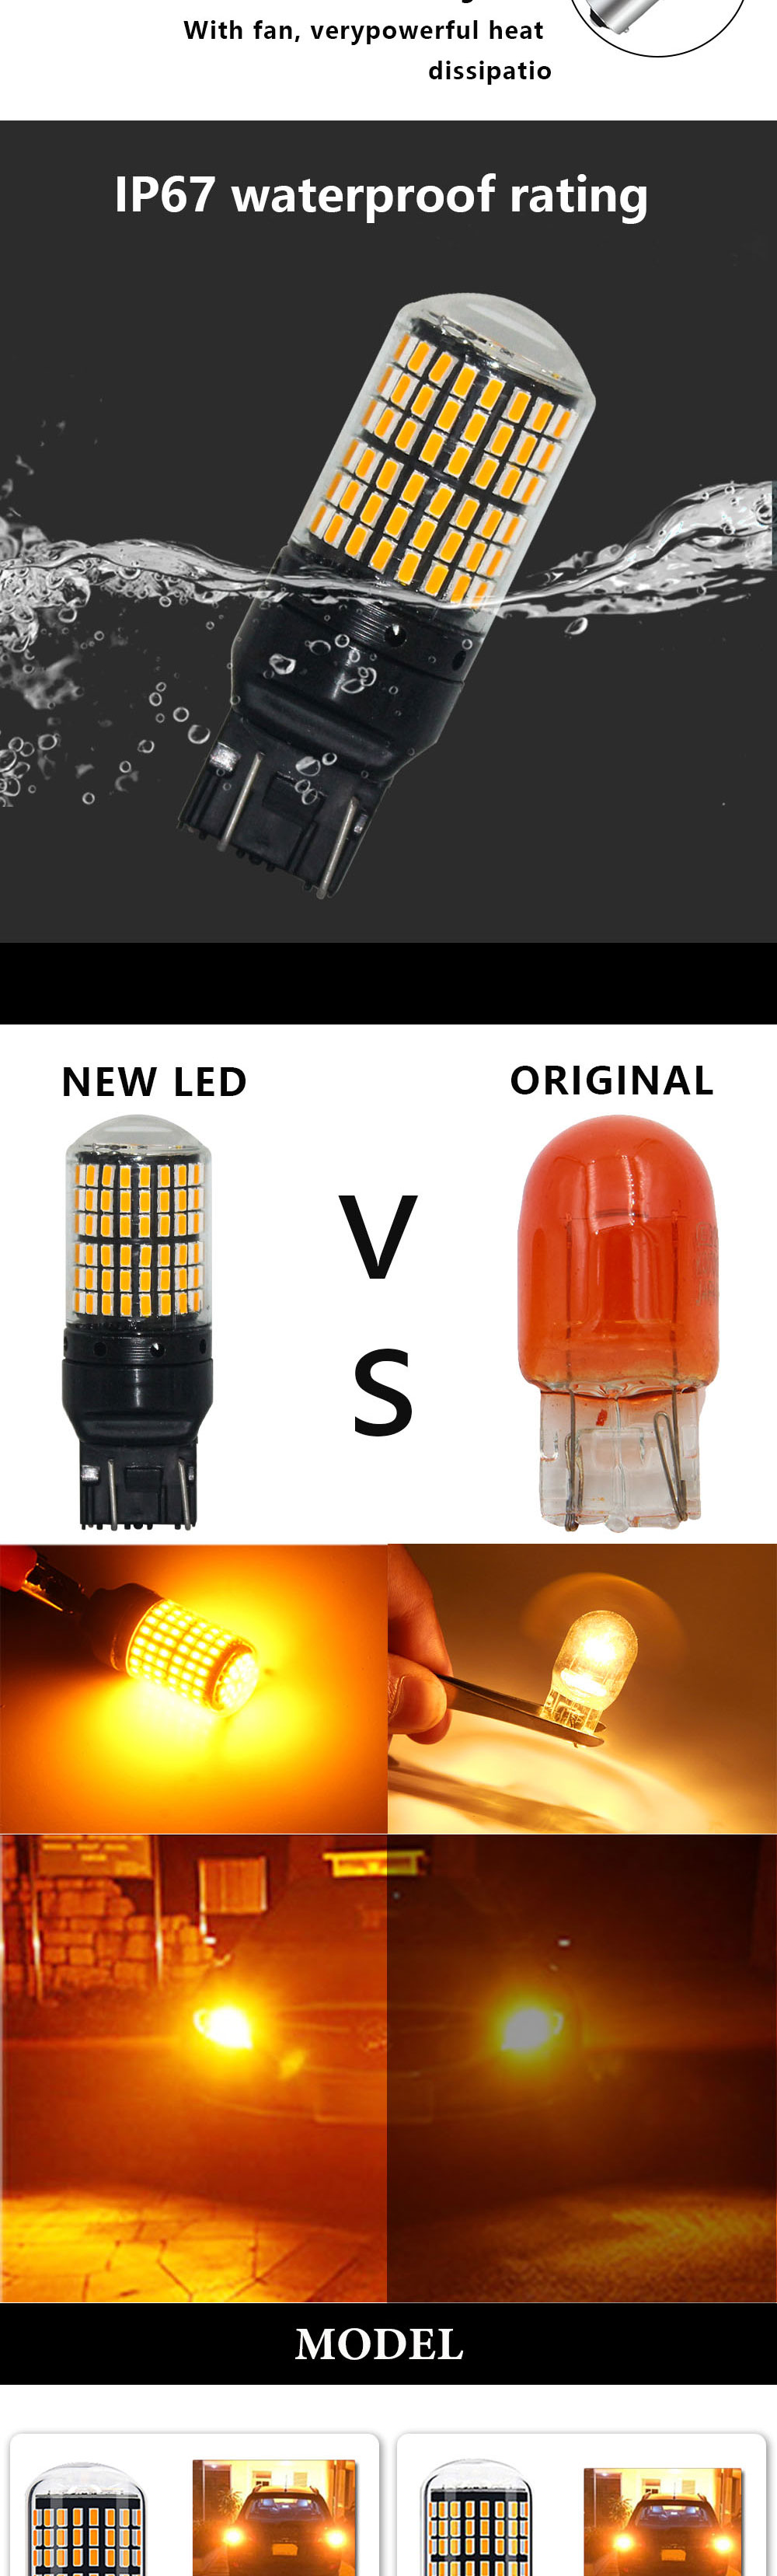 H2d92112c5a8f46ef9e9831957a63c888c RXZ 1pc CanBus p21w py21w T20 LED W21W W21/5W 7440 led S25 1156 BA15S BAU15S Bulbs 3014 144smd car Turn Signal Lights Brake lamp